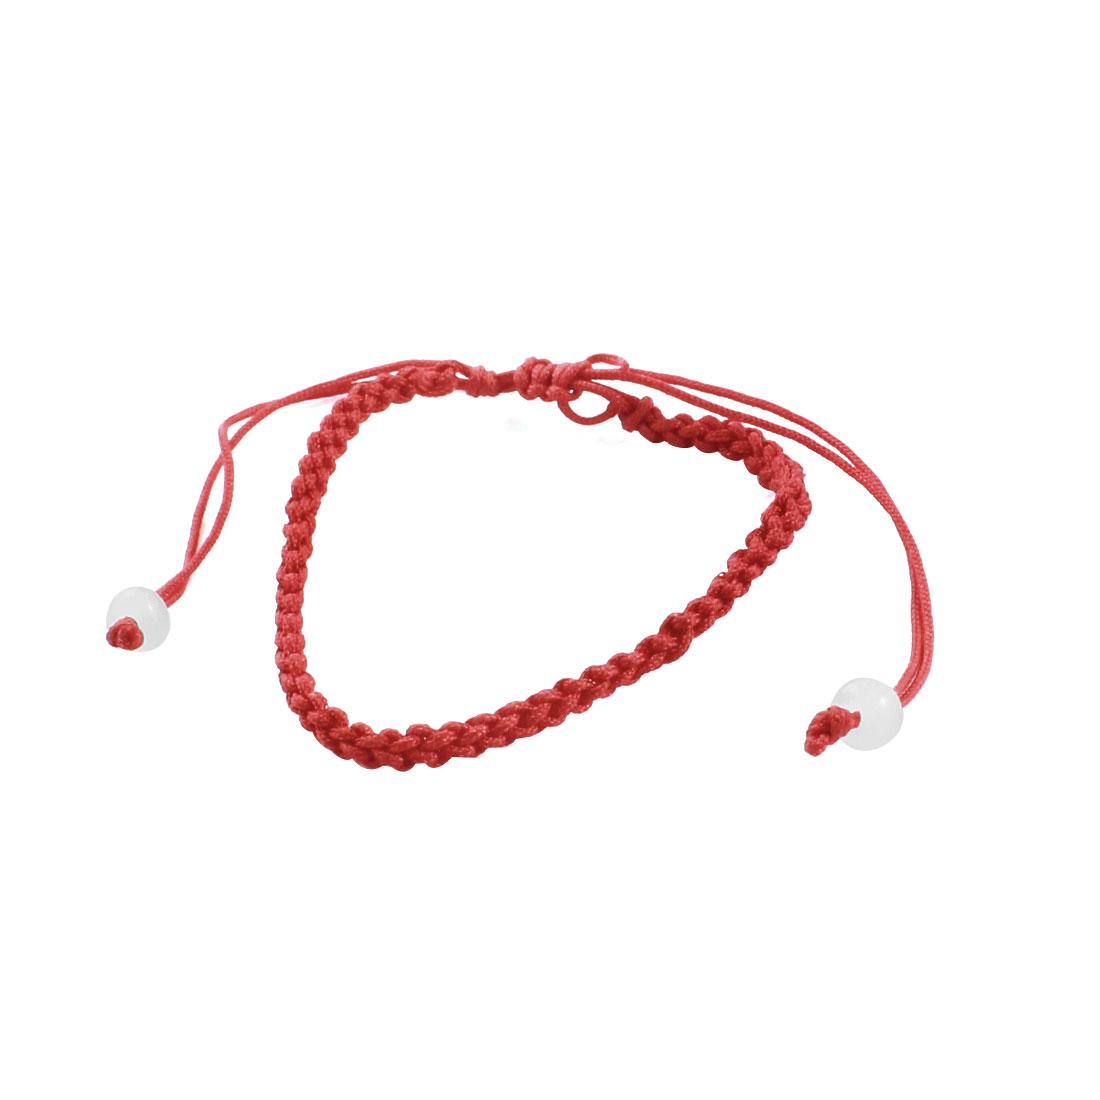 Adjustable Red Braided String White Plastic Bead Detailing Bracelet Anklet